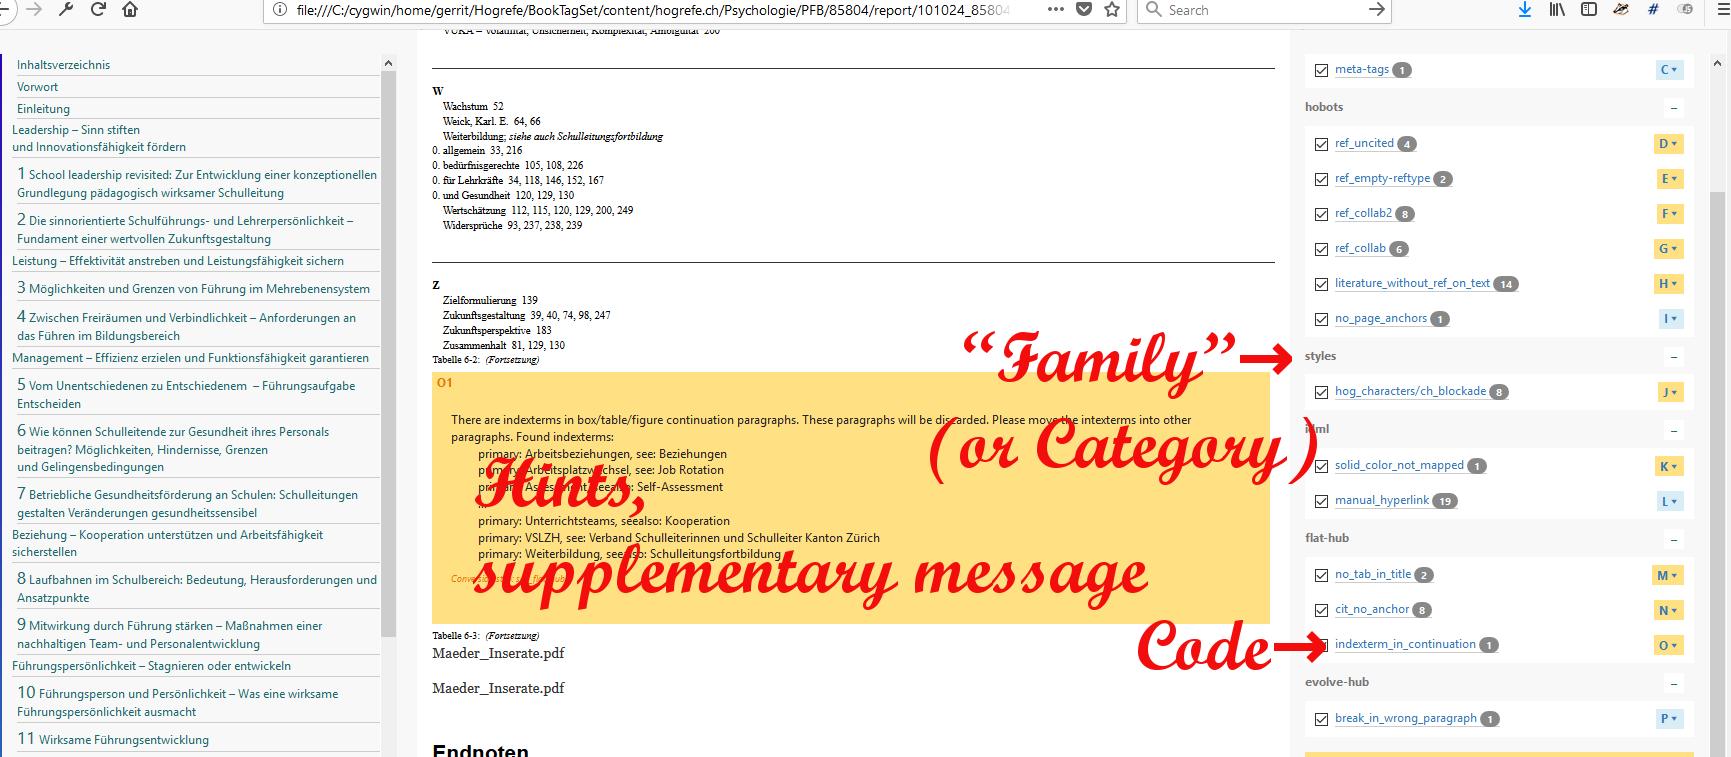 supplementary_message